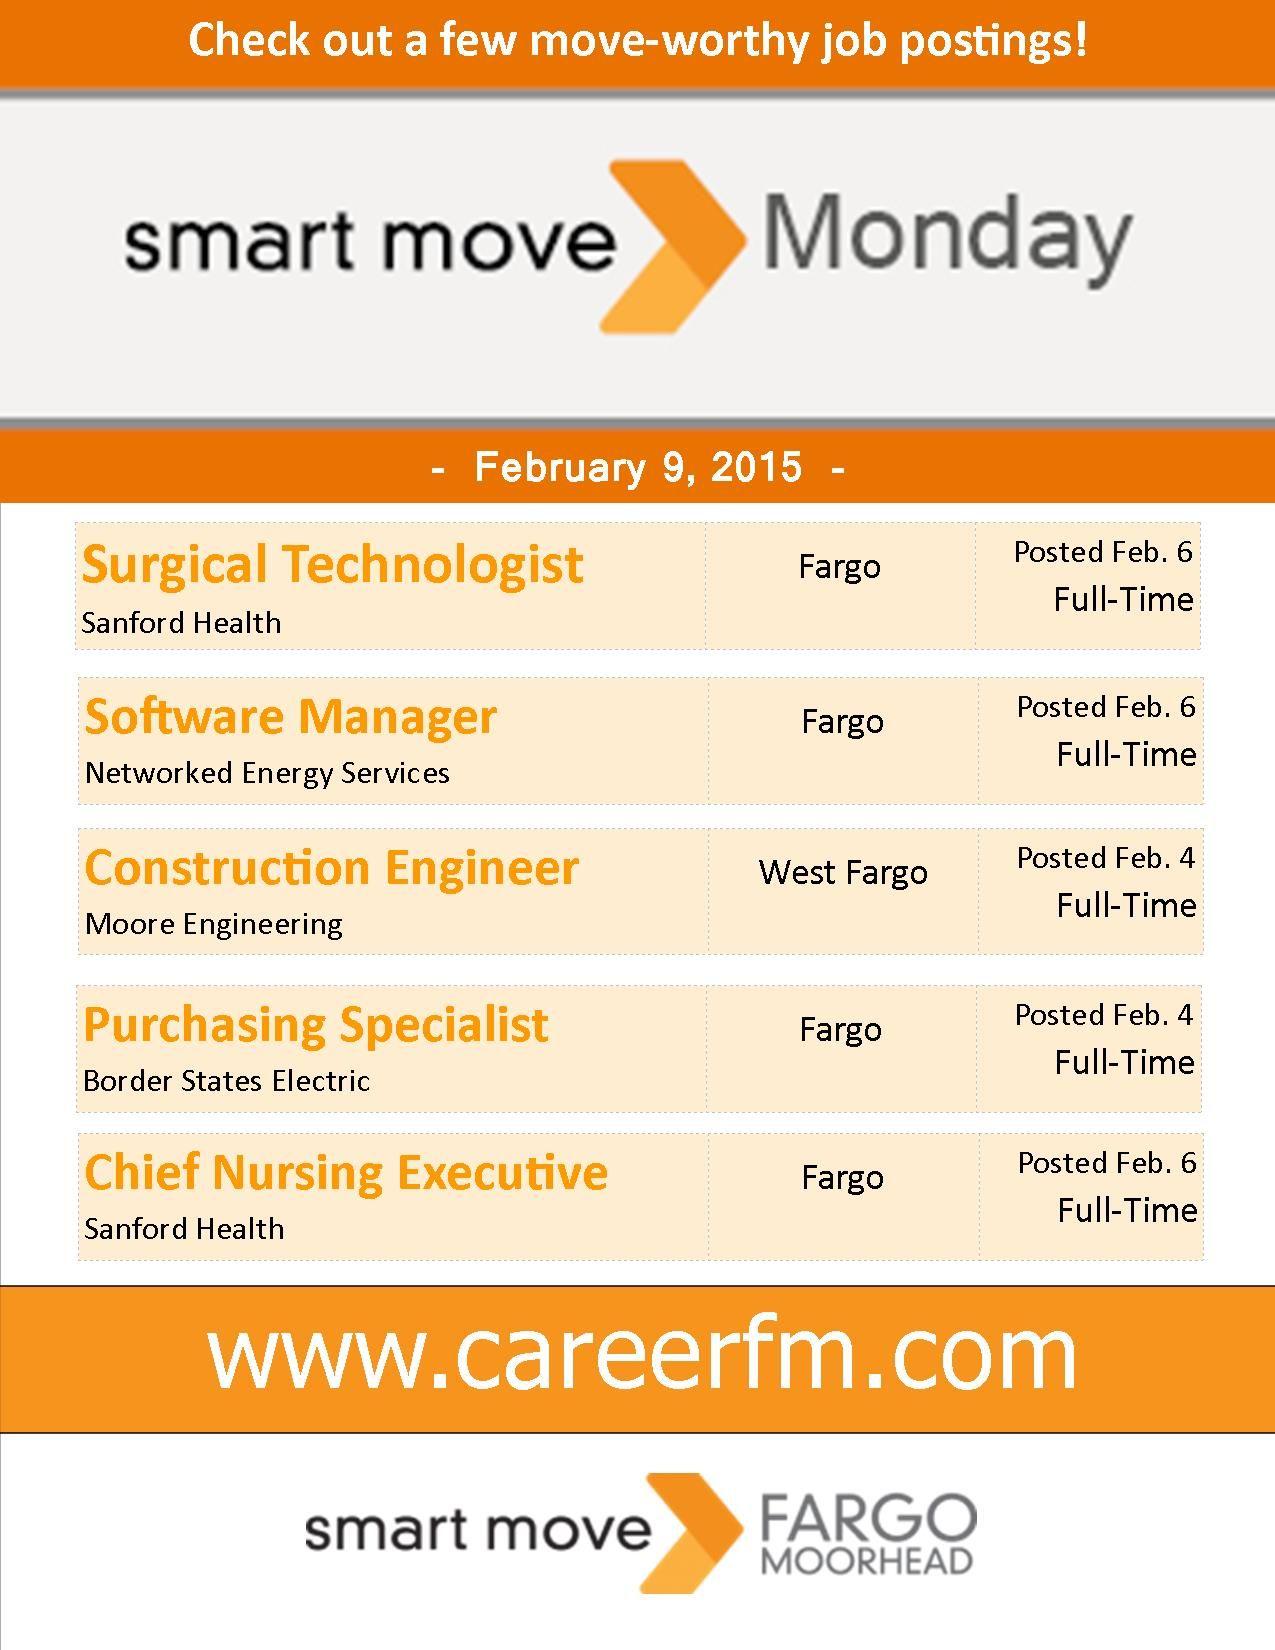 Smart move monday job posting business analyst sanford